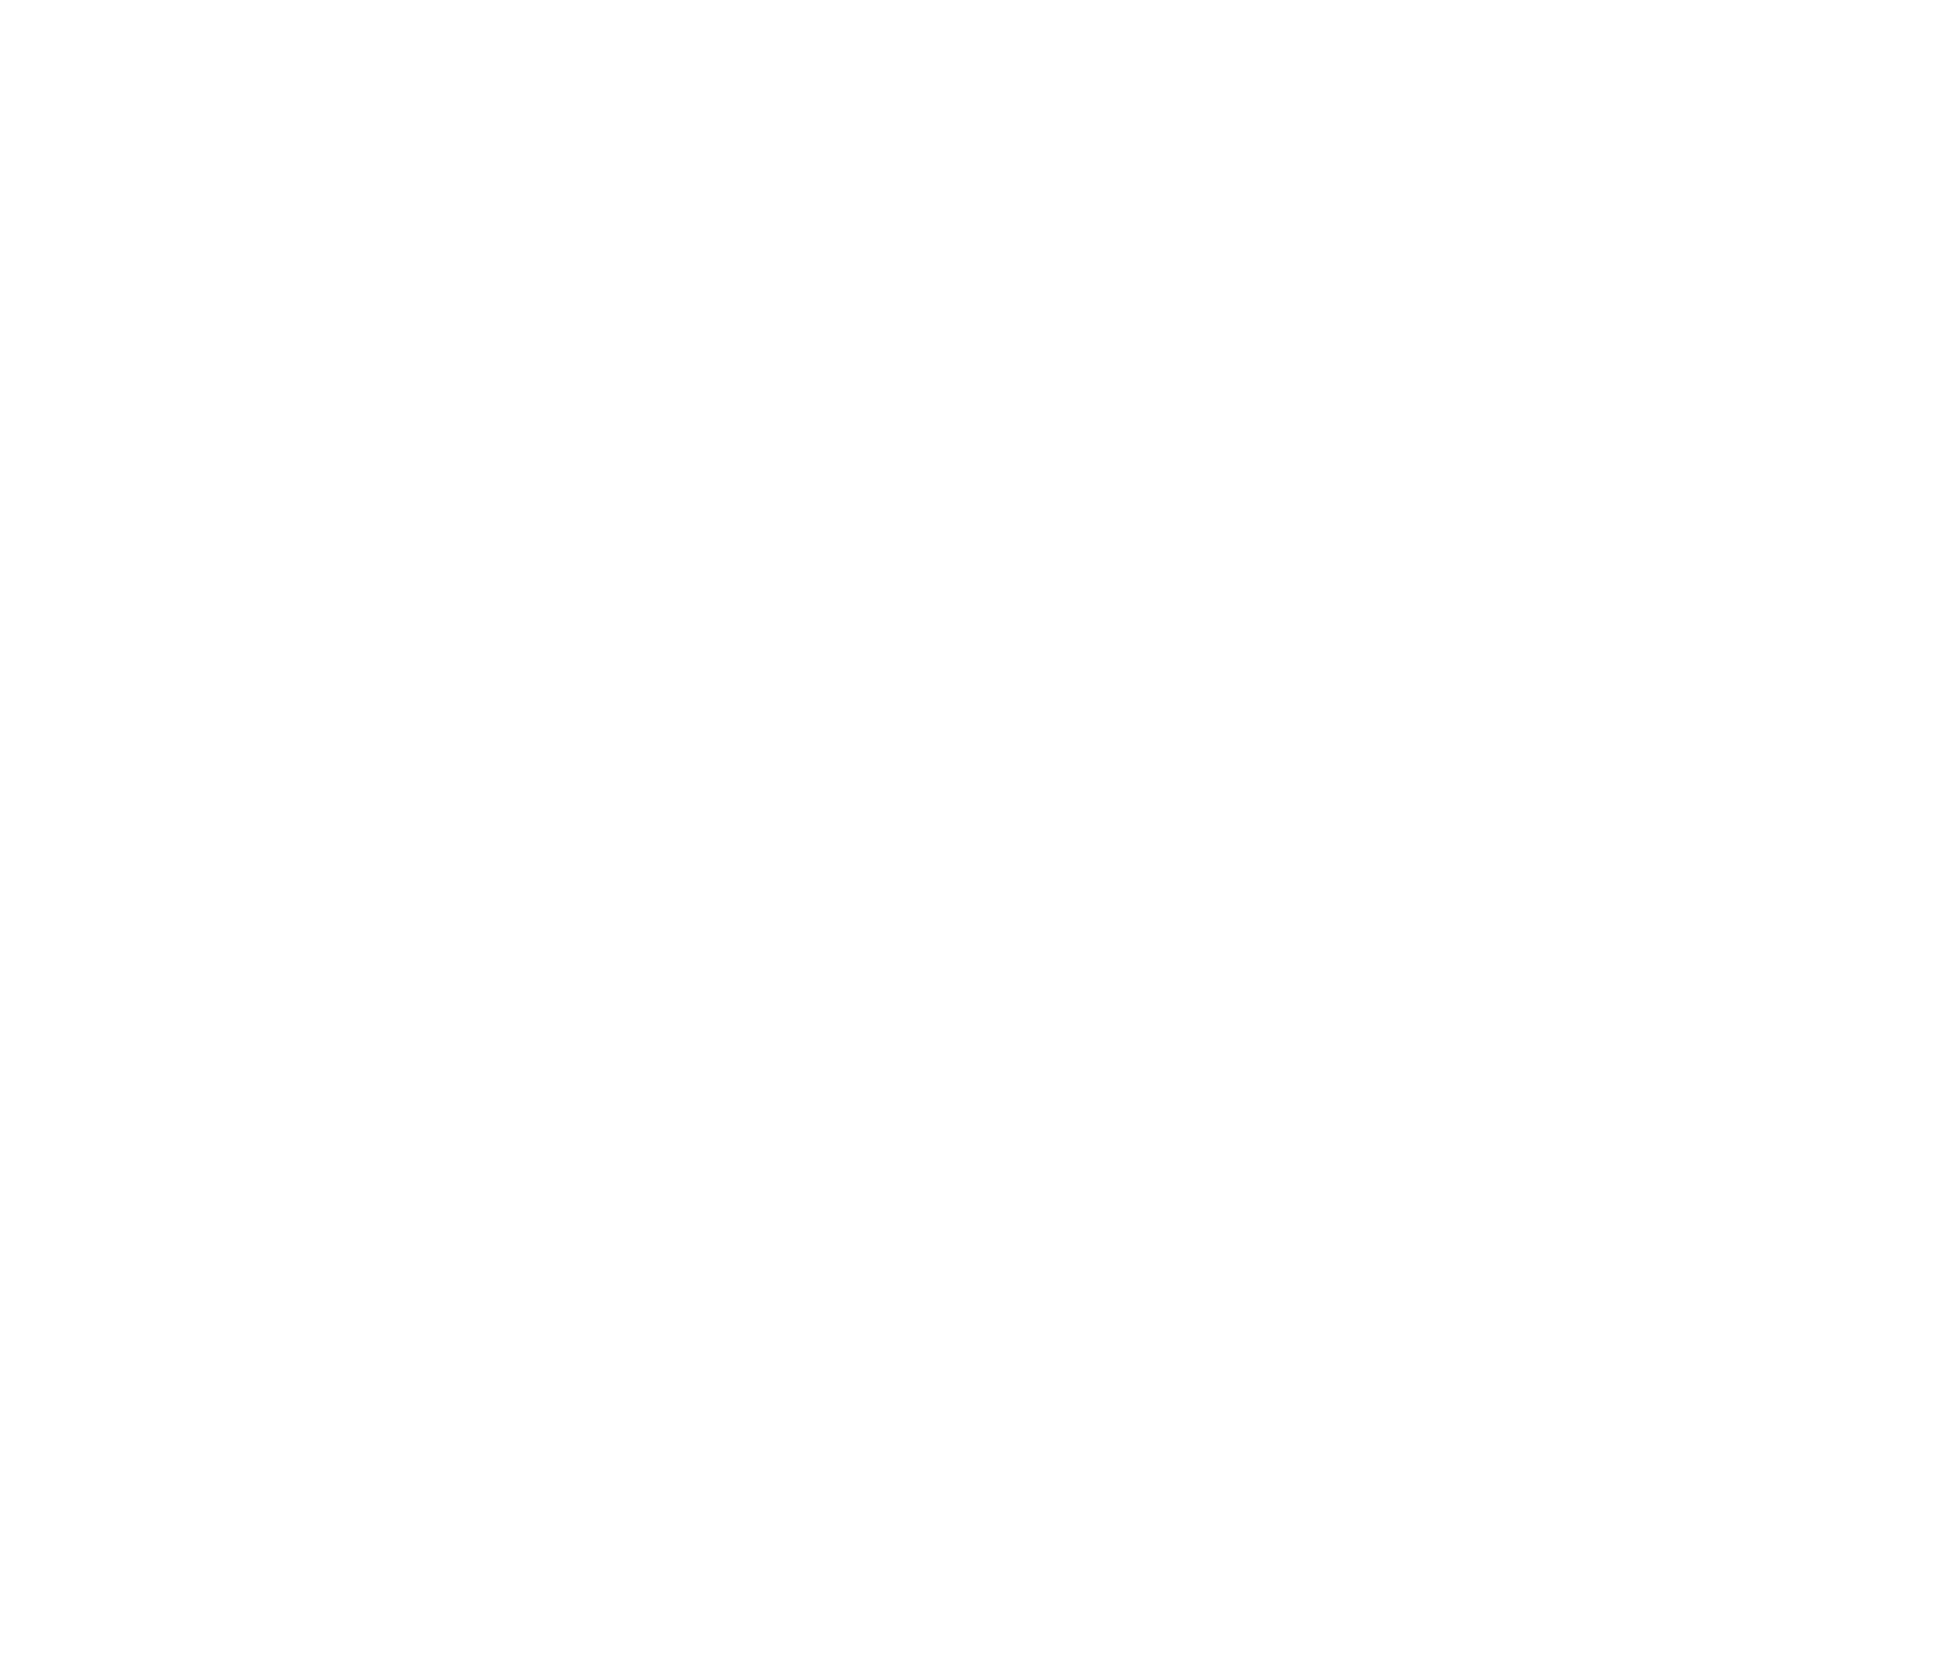 Interactive House icon